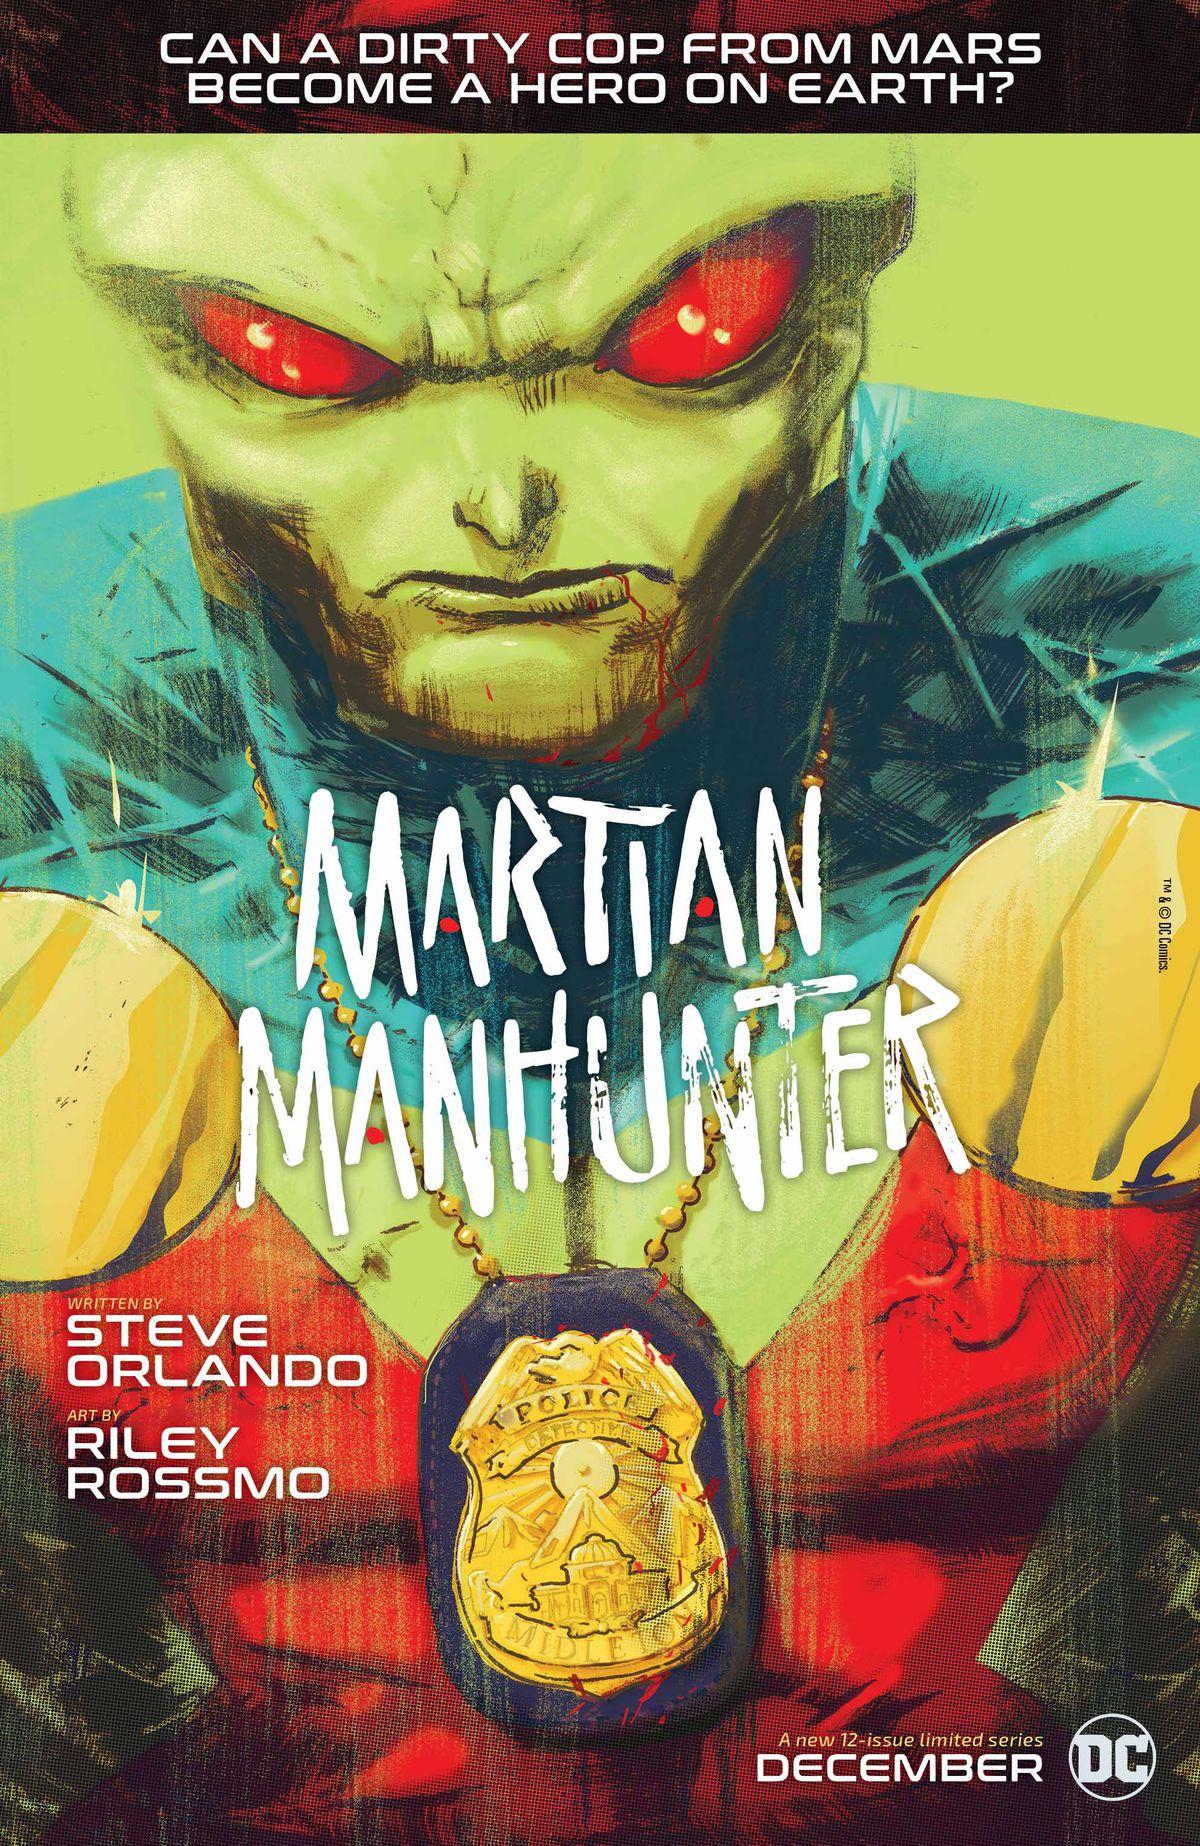 From Martian Manhunter, DC Comics (2018).